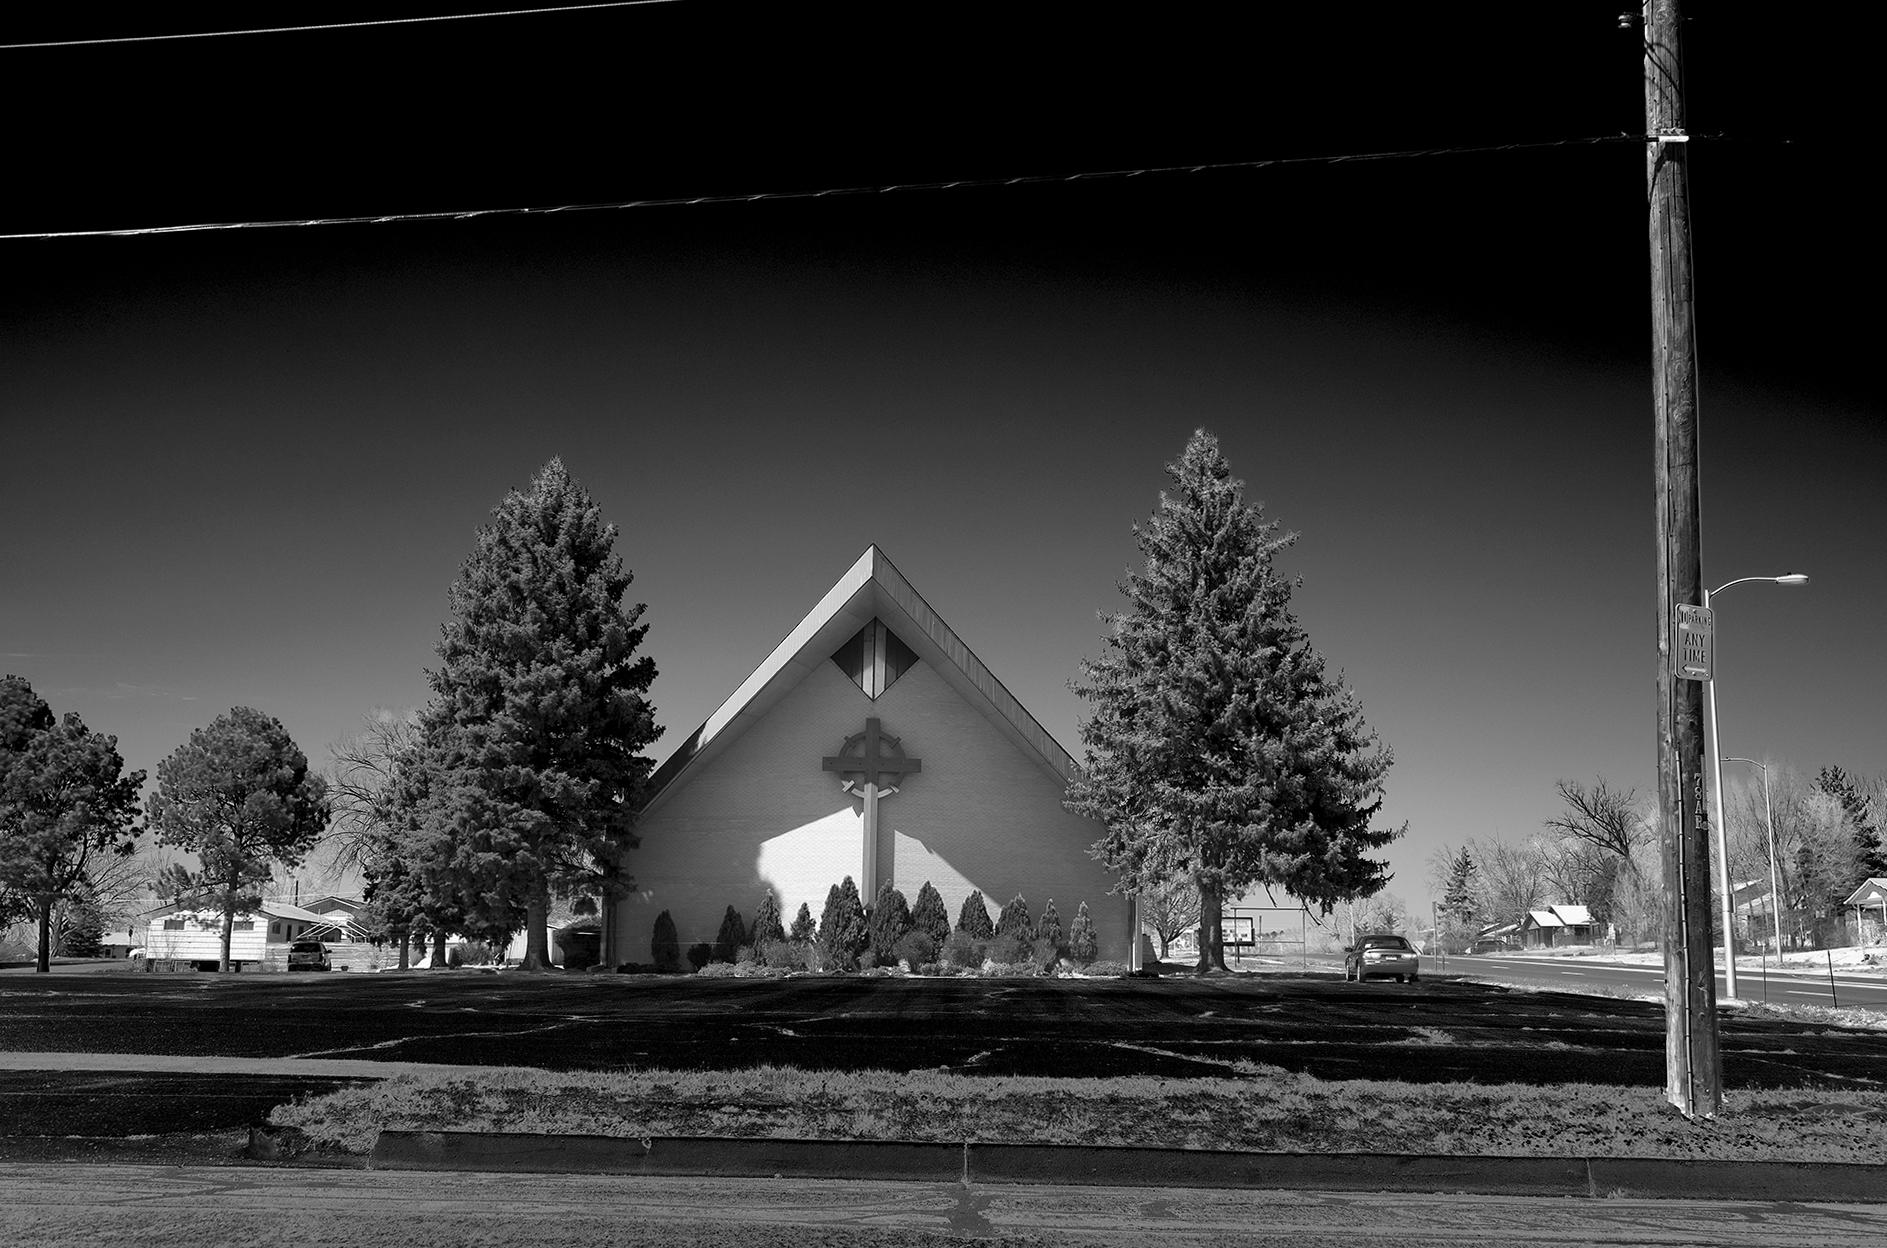 Mt. Calvary Luthern Church; Life Church (Pentecostal); Pikes Peak Biker Church (Non-denominational); Praise Chapel (Non-denominational)